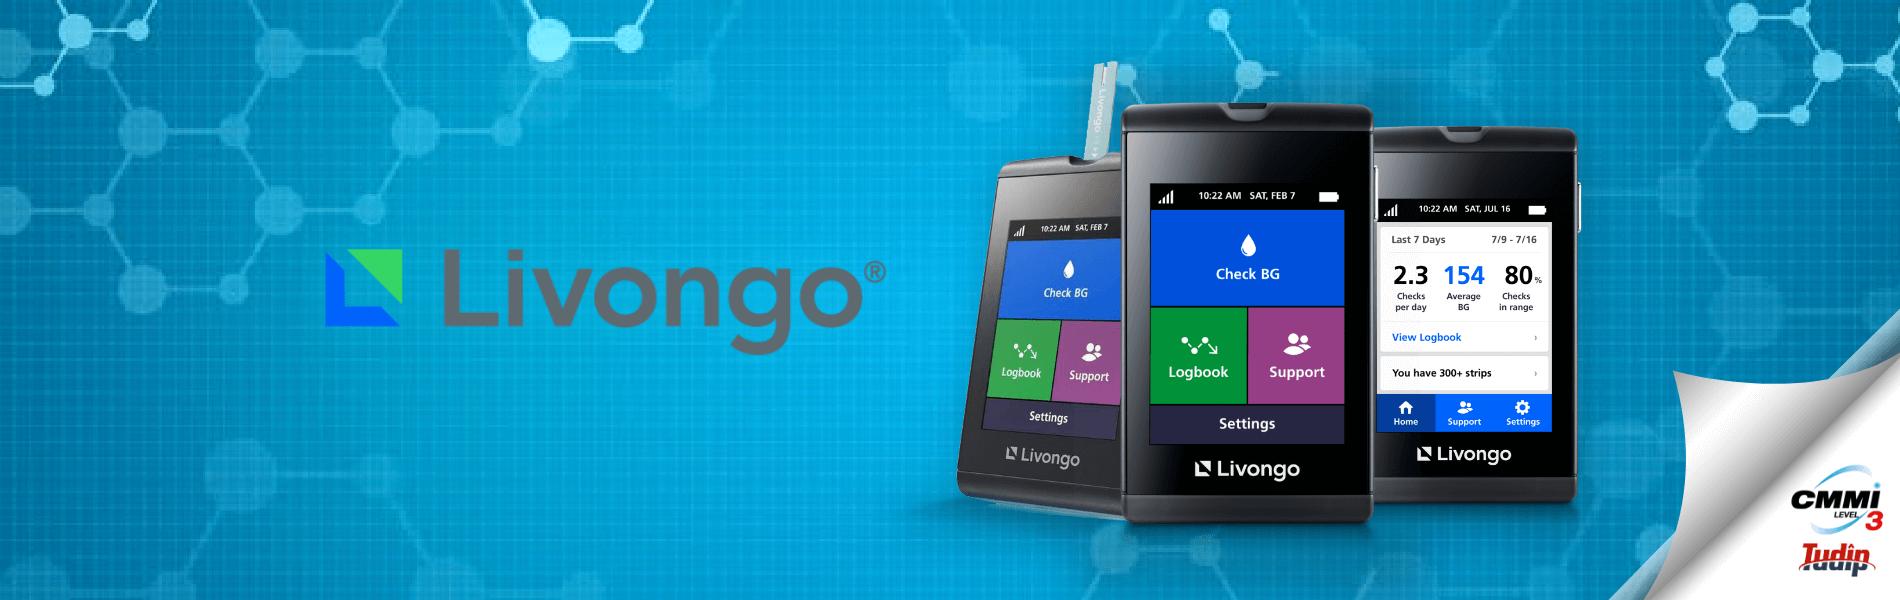 Livongo_Usage_BG_Meter_Device_Firmware